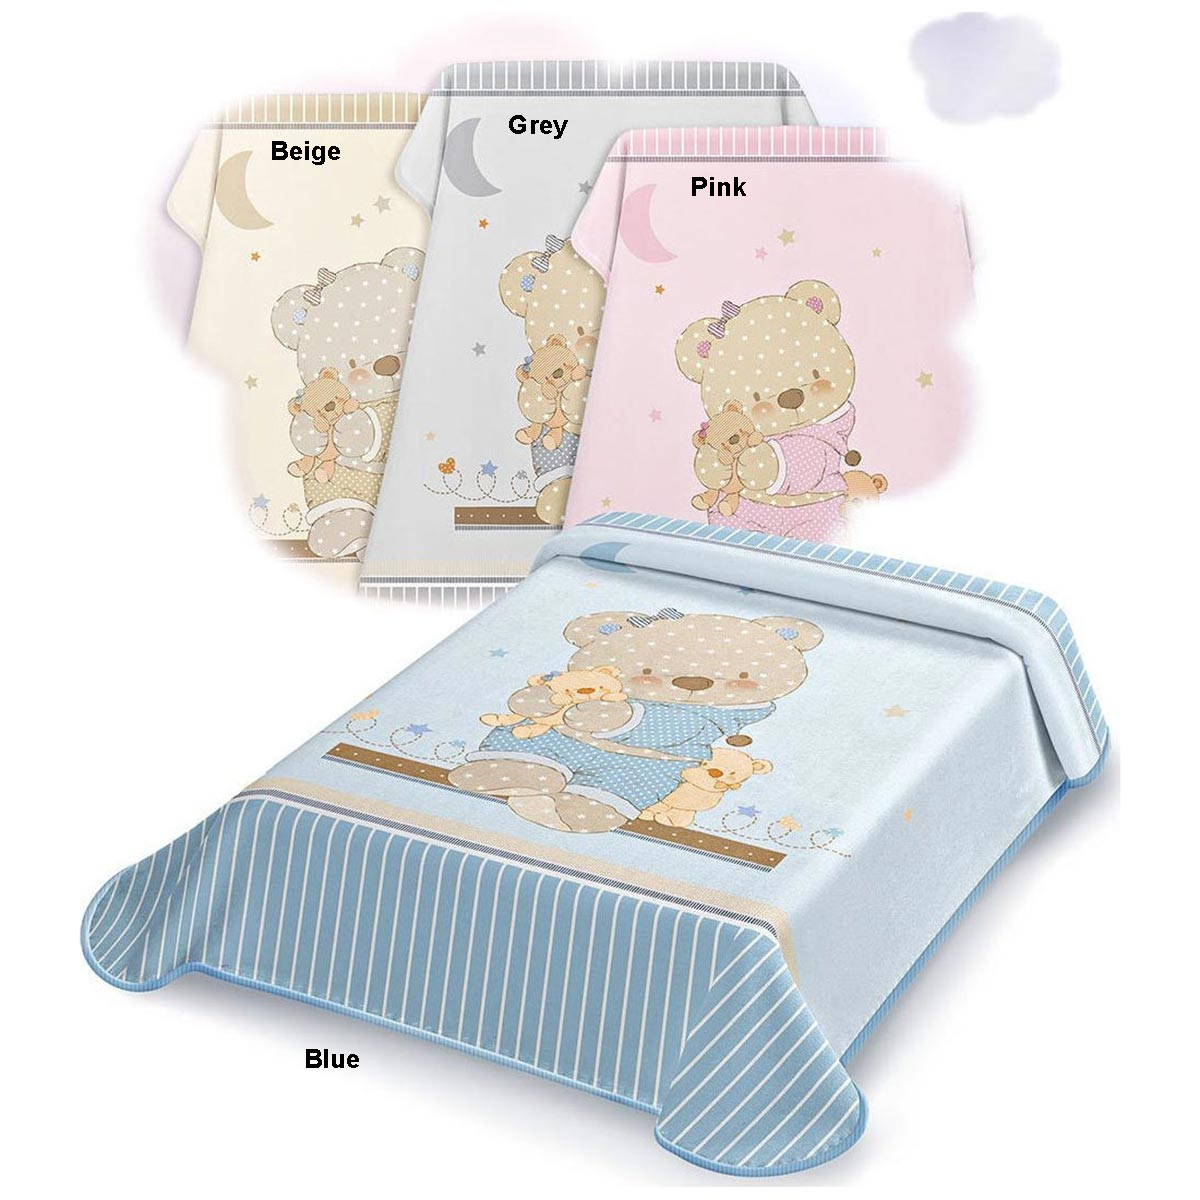 Bunny bebe βρεφική κουβέρτα βελουτέ Belpla Ster